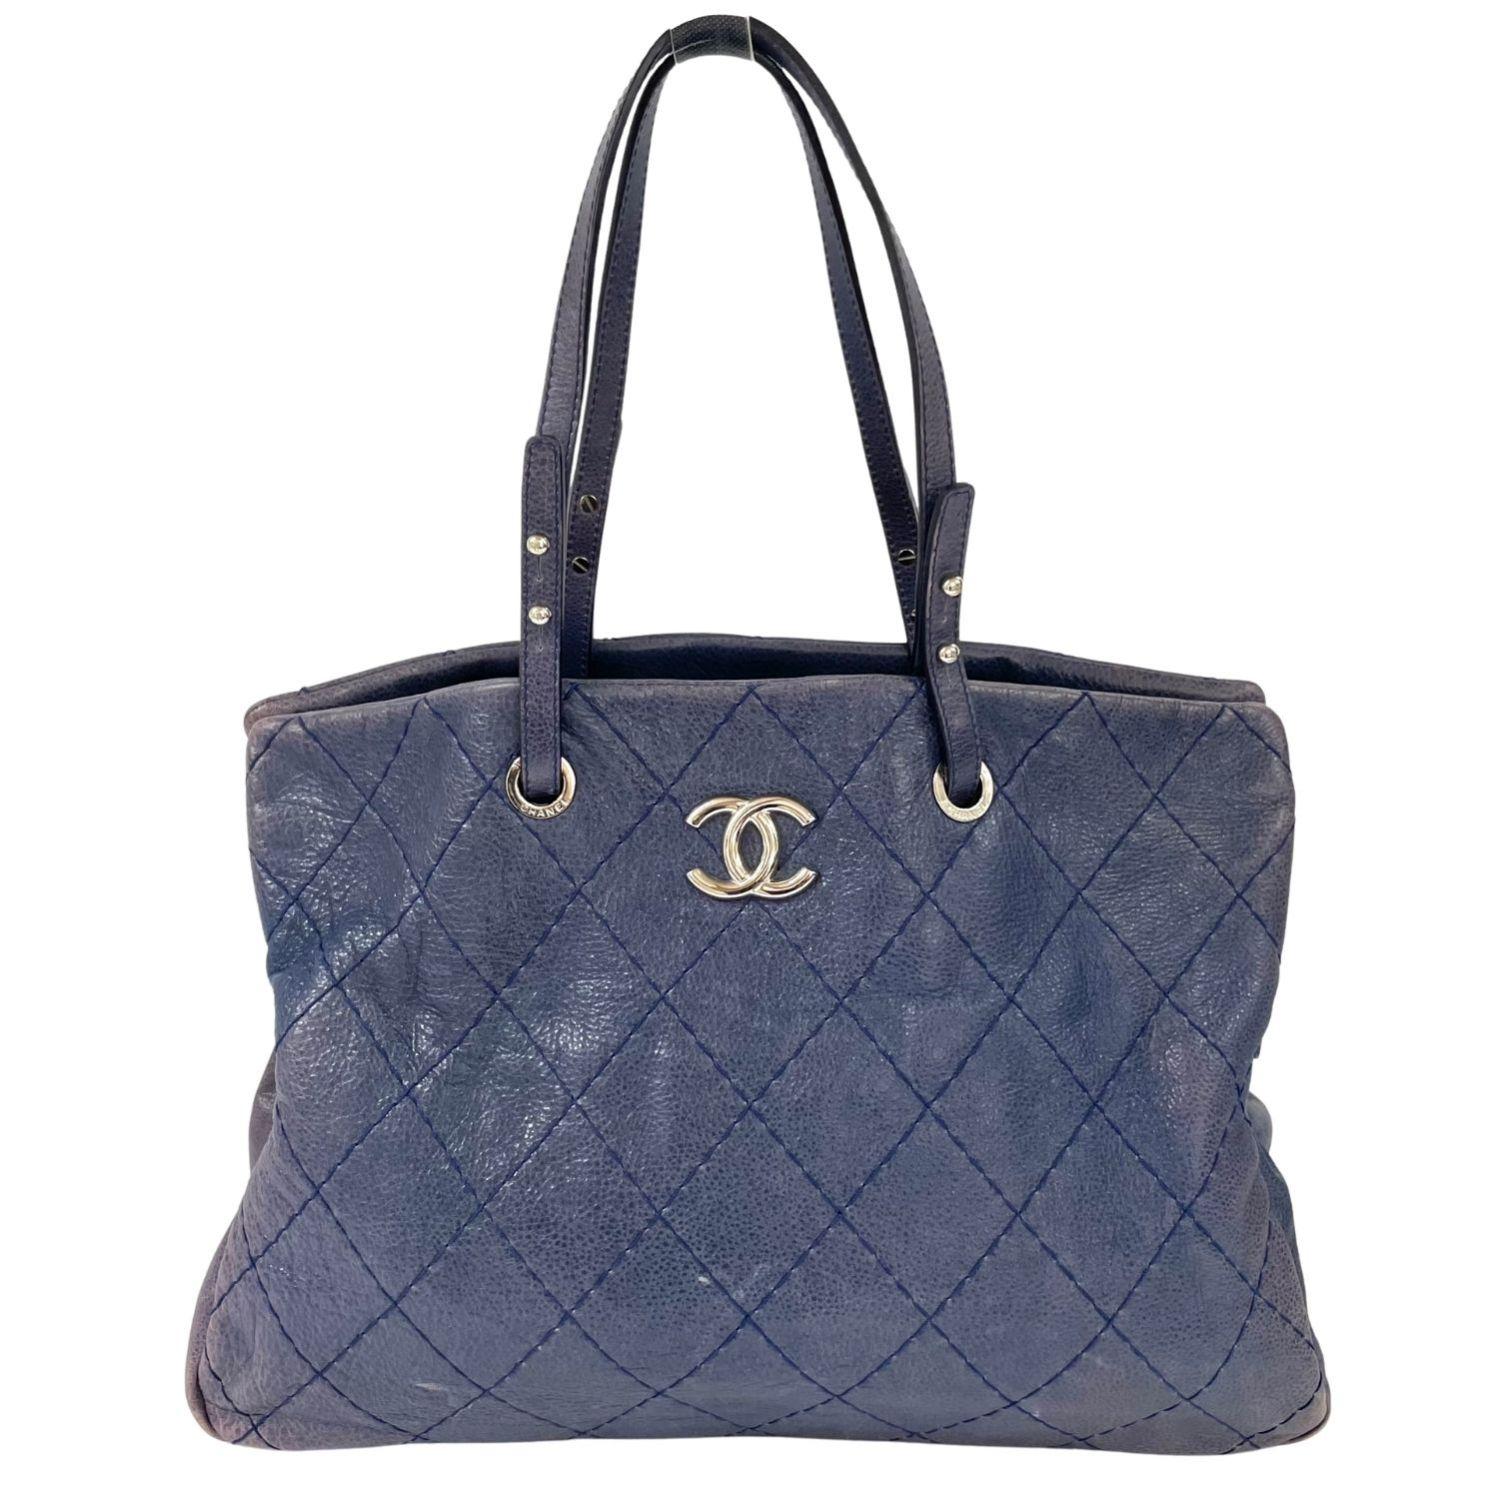 Bolsa Chanel On The Road